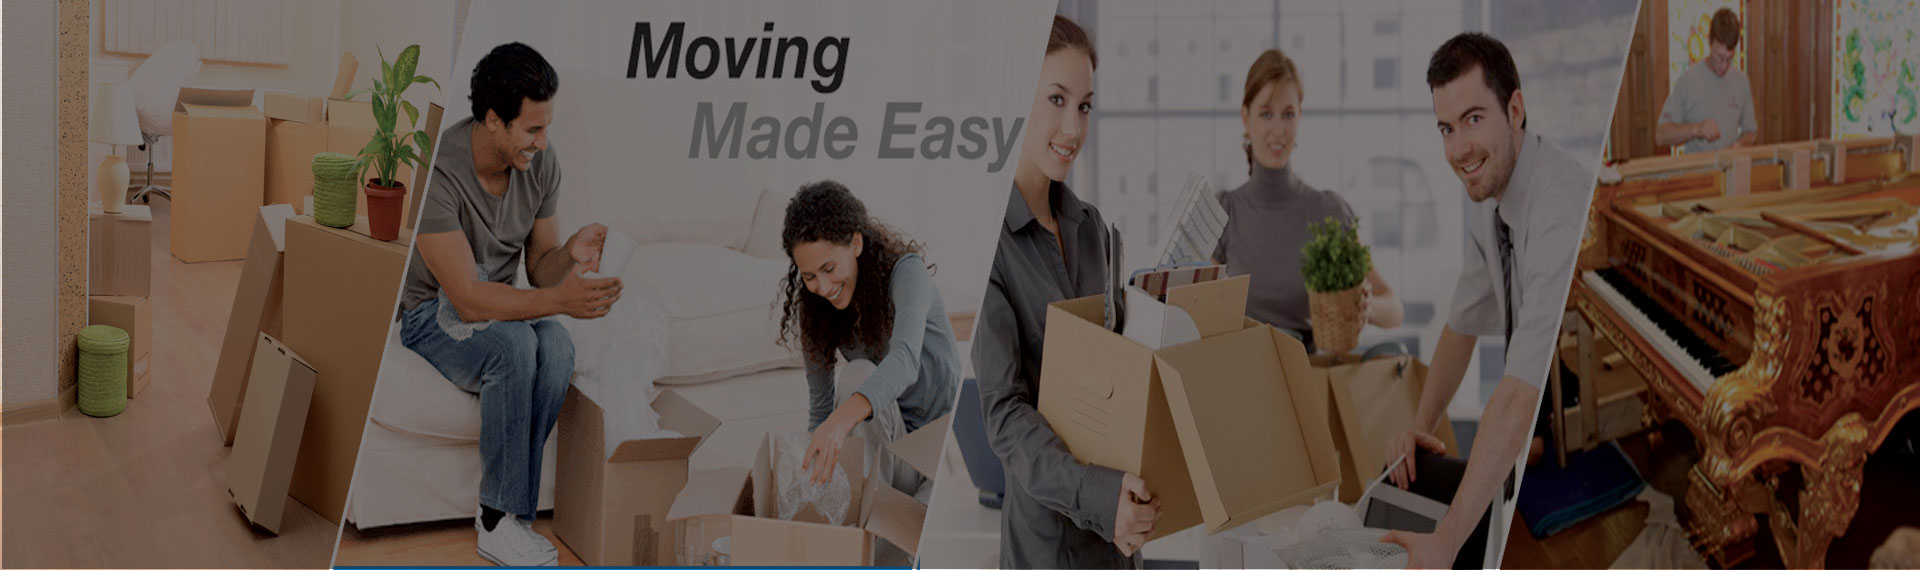 JV Moving Corp Union NJ